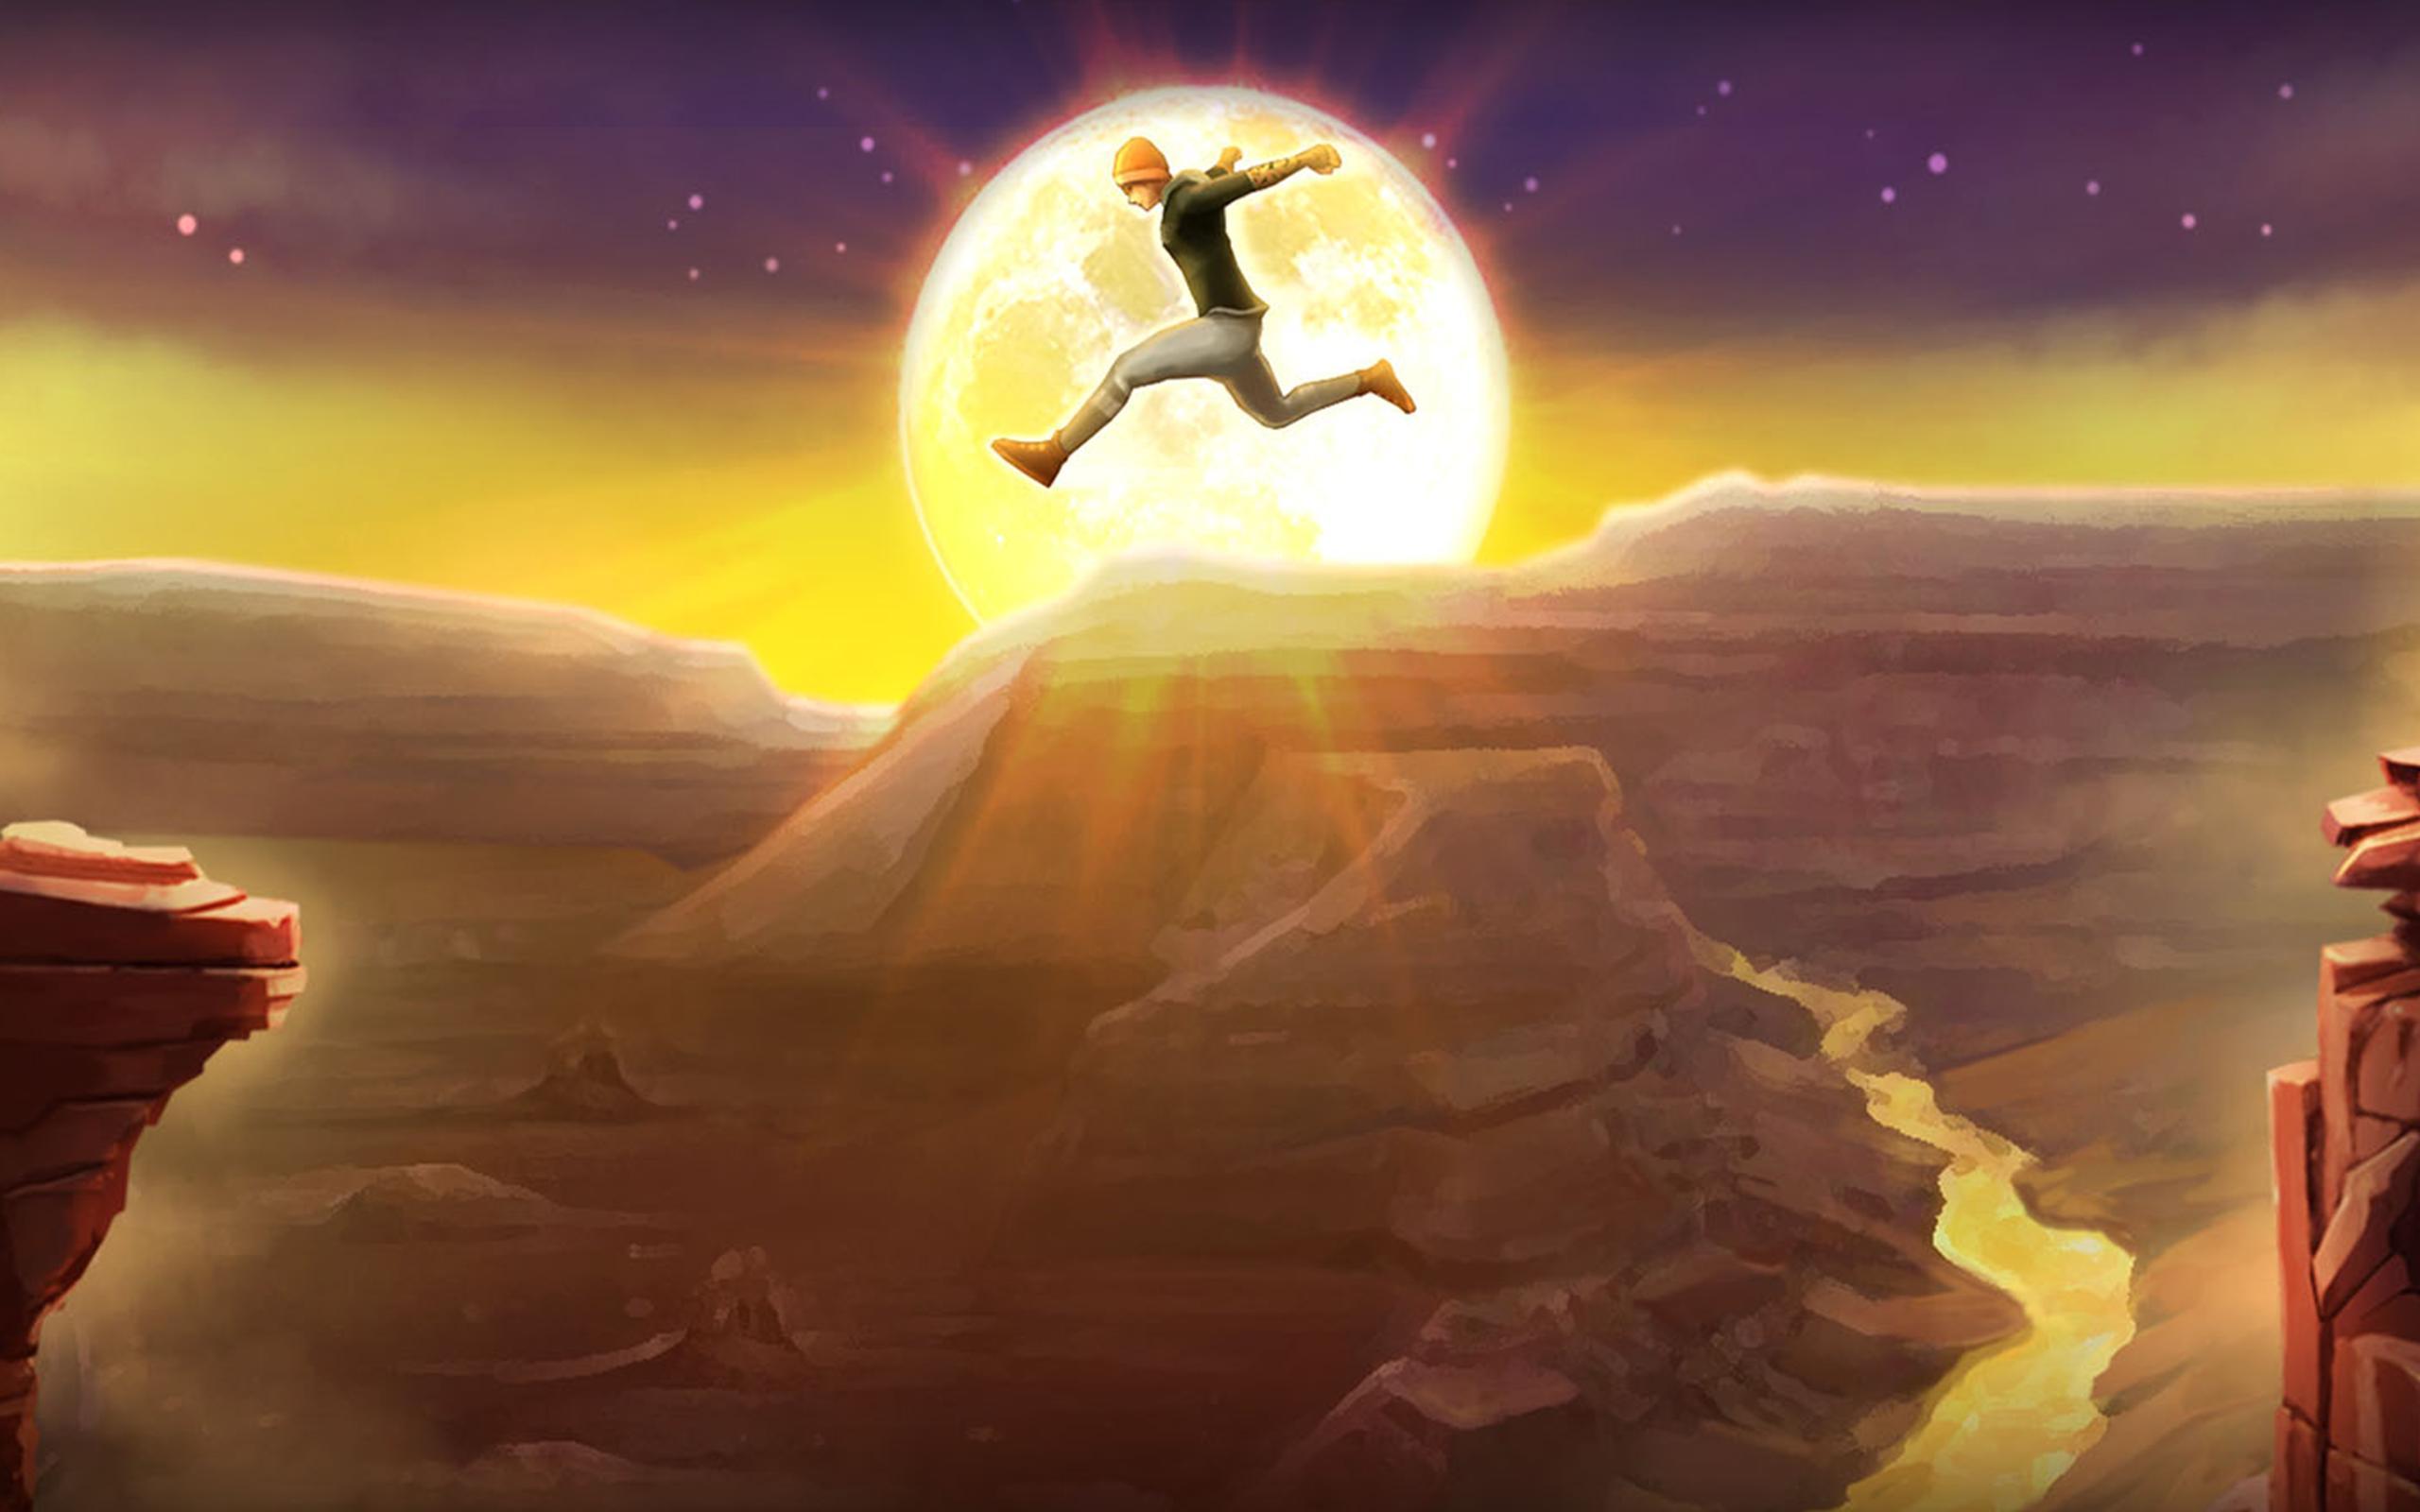 Sky Dancer Run - Running Game 4.2.0 Screenshot 11